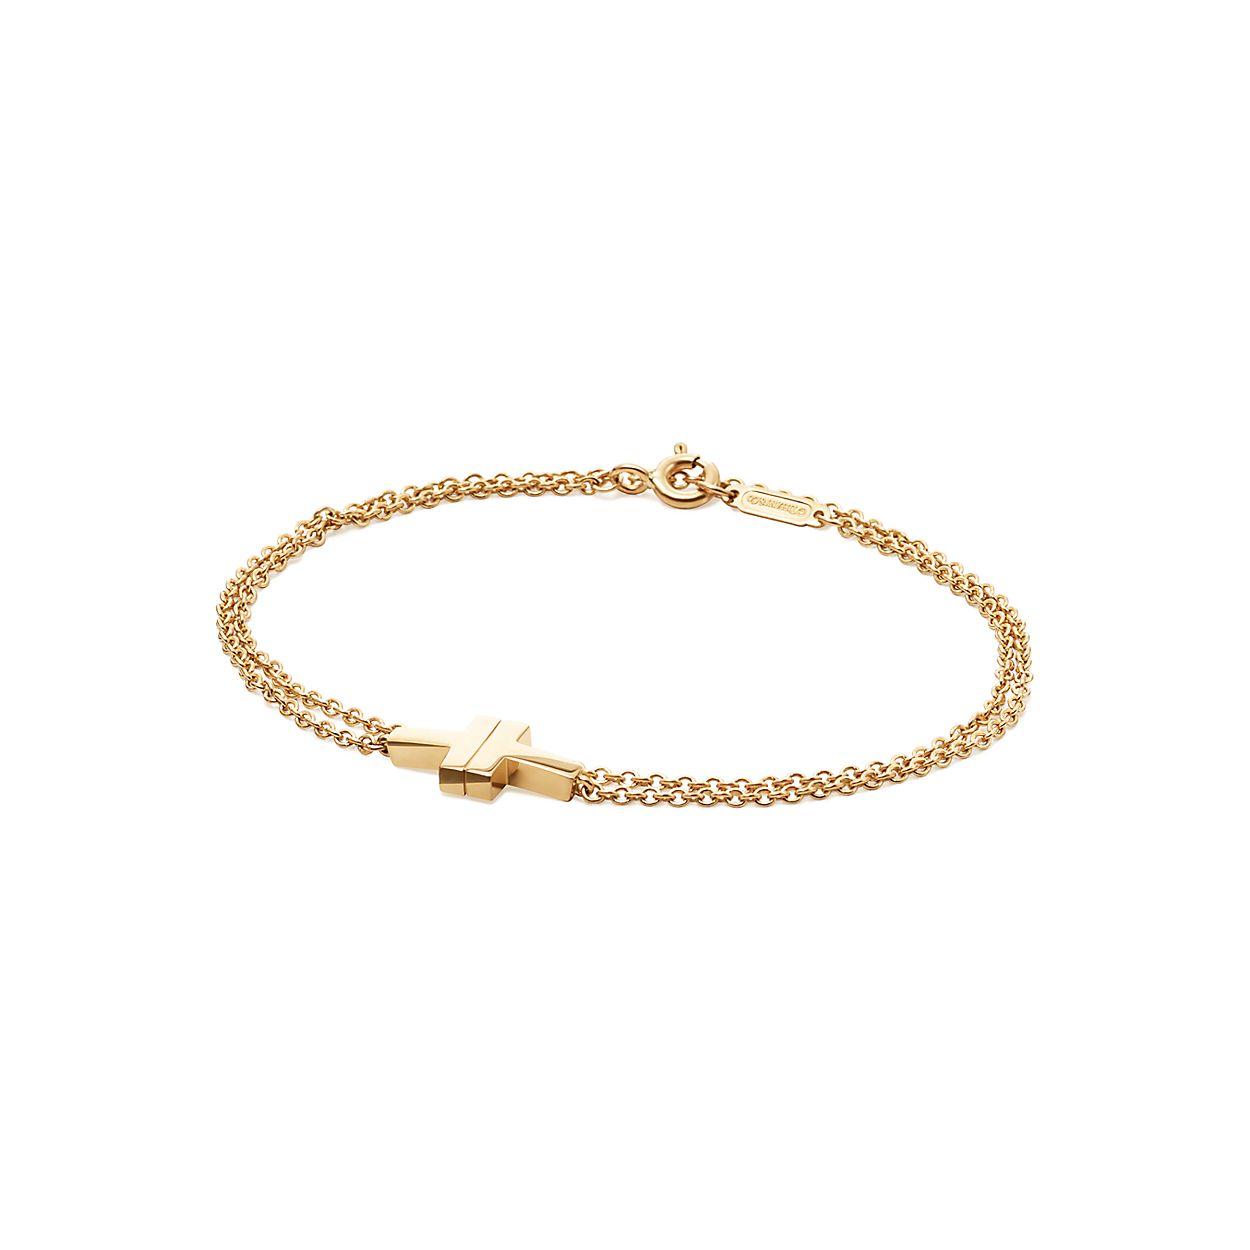 18b30a607 Tiffany T Two double chain bracelet in 18k gold, medium. | Tiffany & Co.